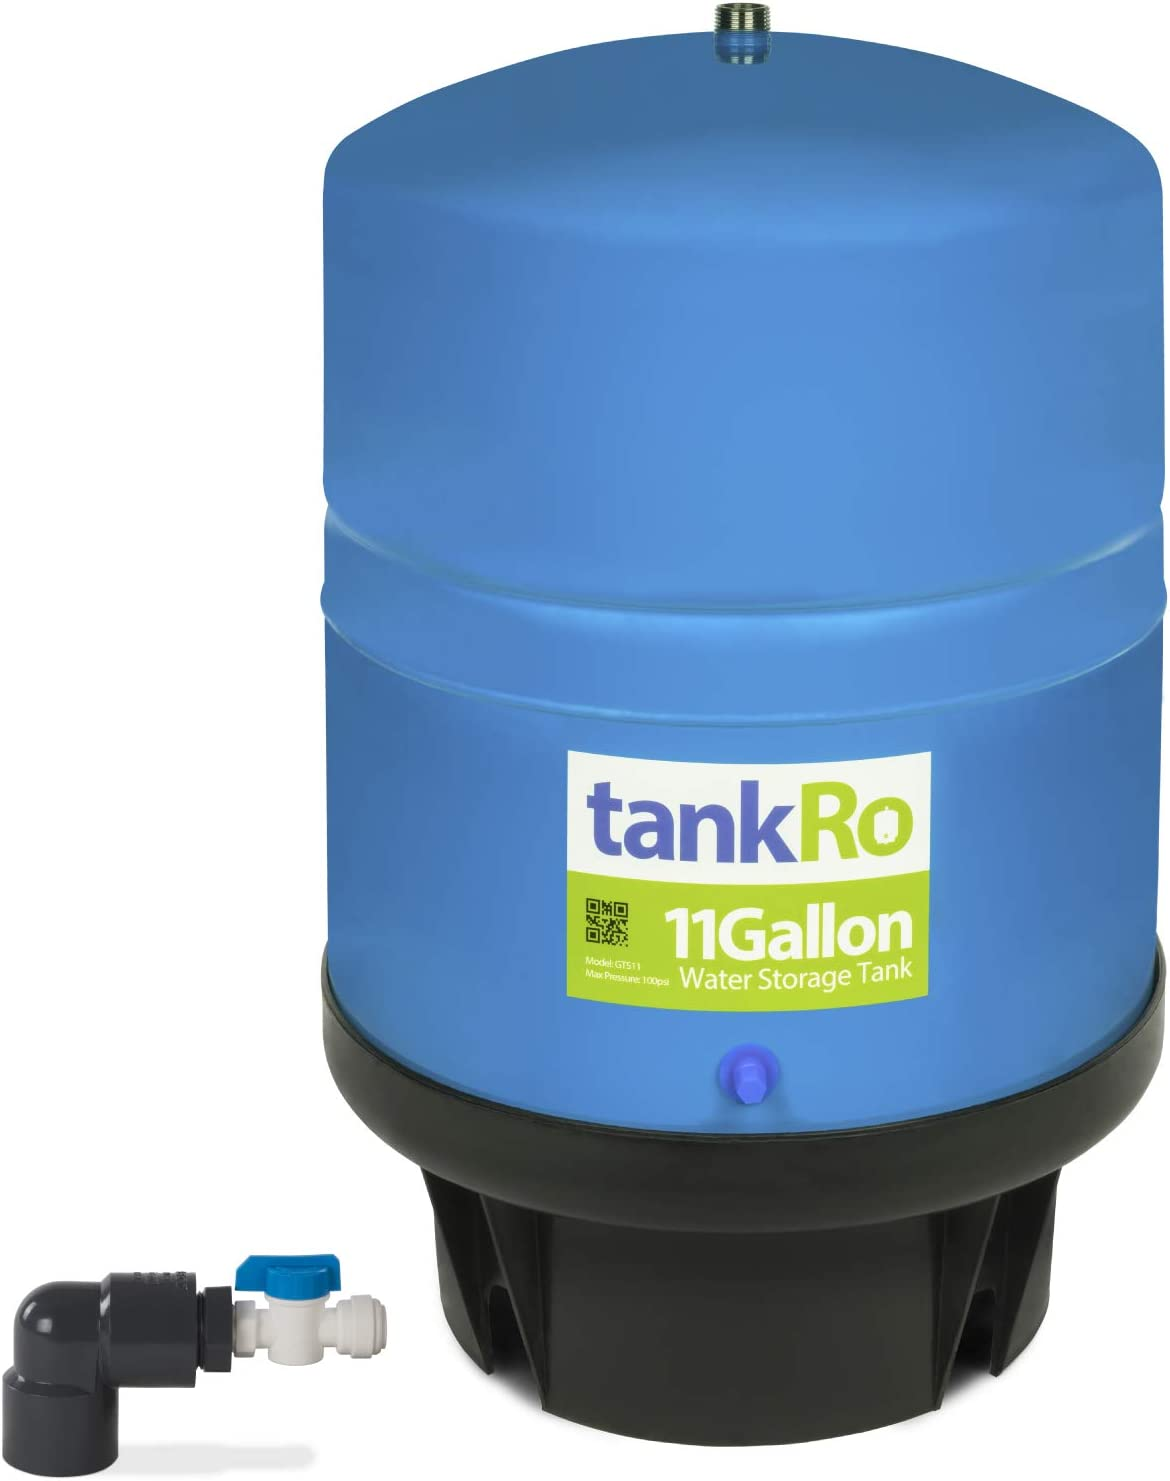 11 Gallon RO Expansion Tank – Large Reverse Osmosis Water Storage Pressure Tank by tankRO – with FREE Tank Ball Valve